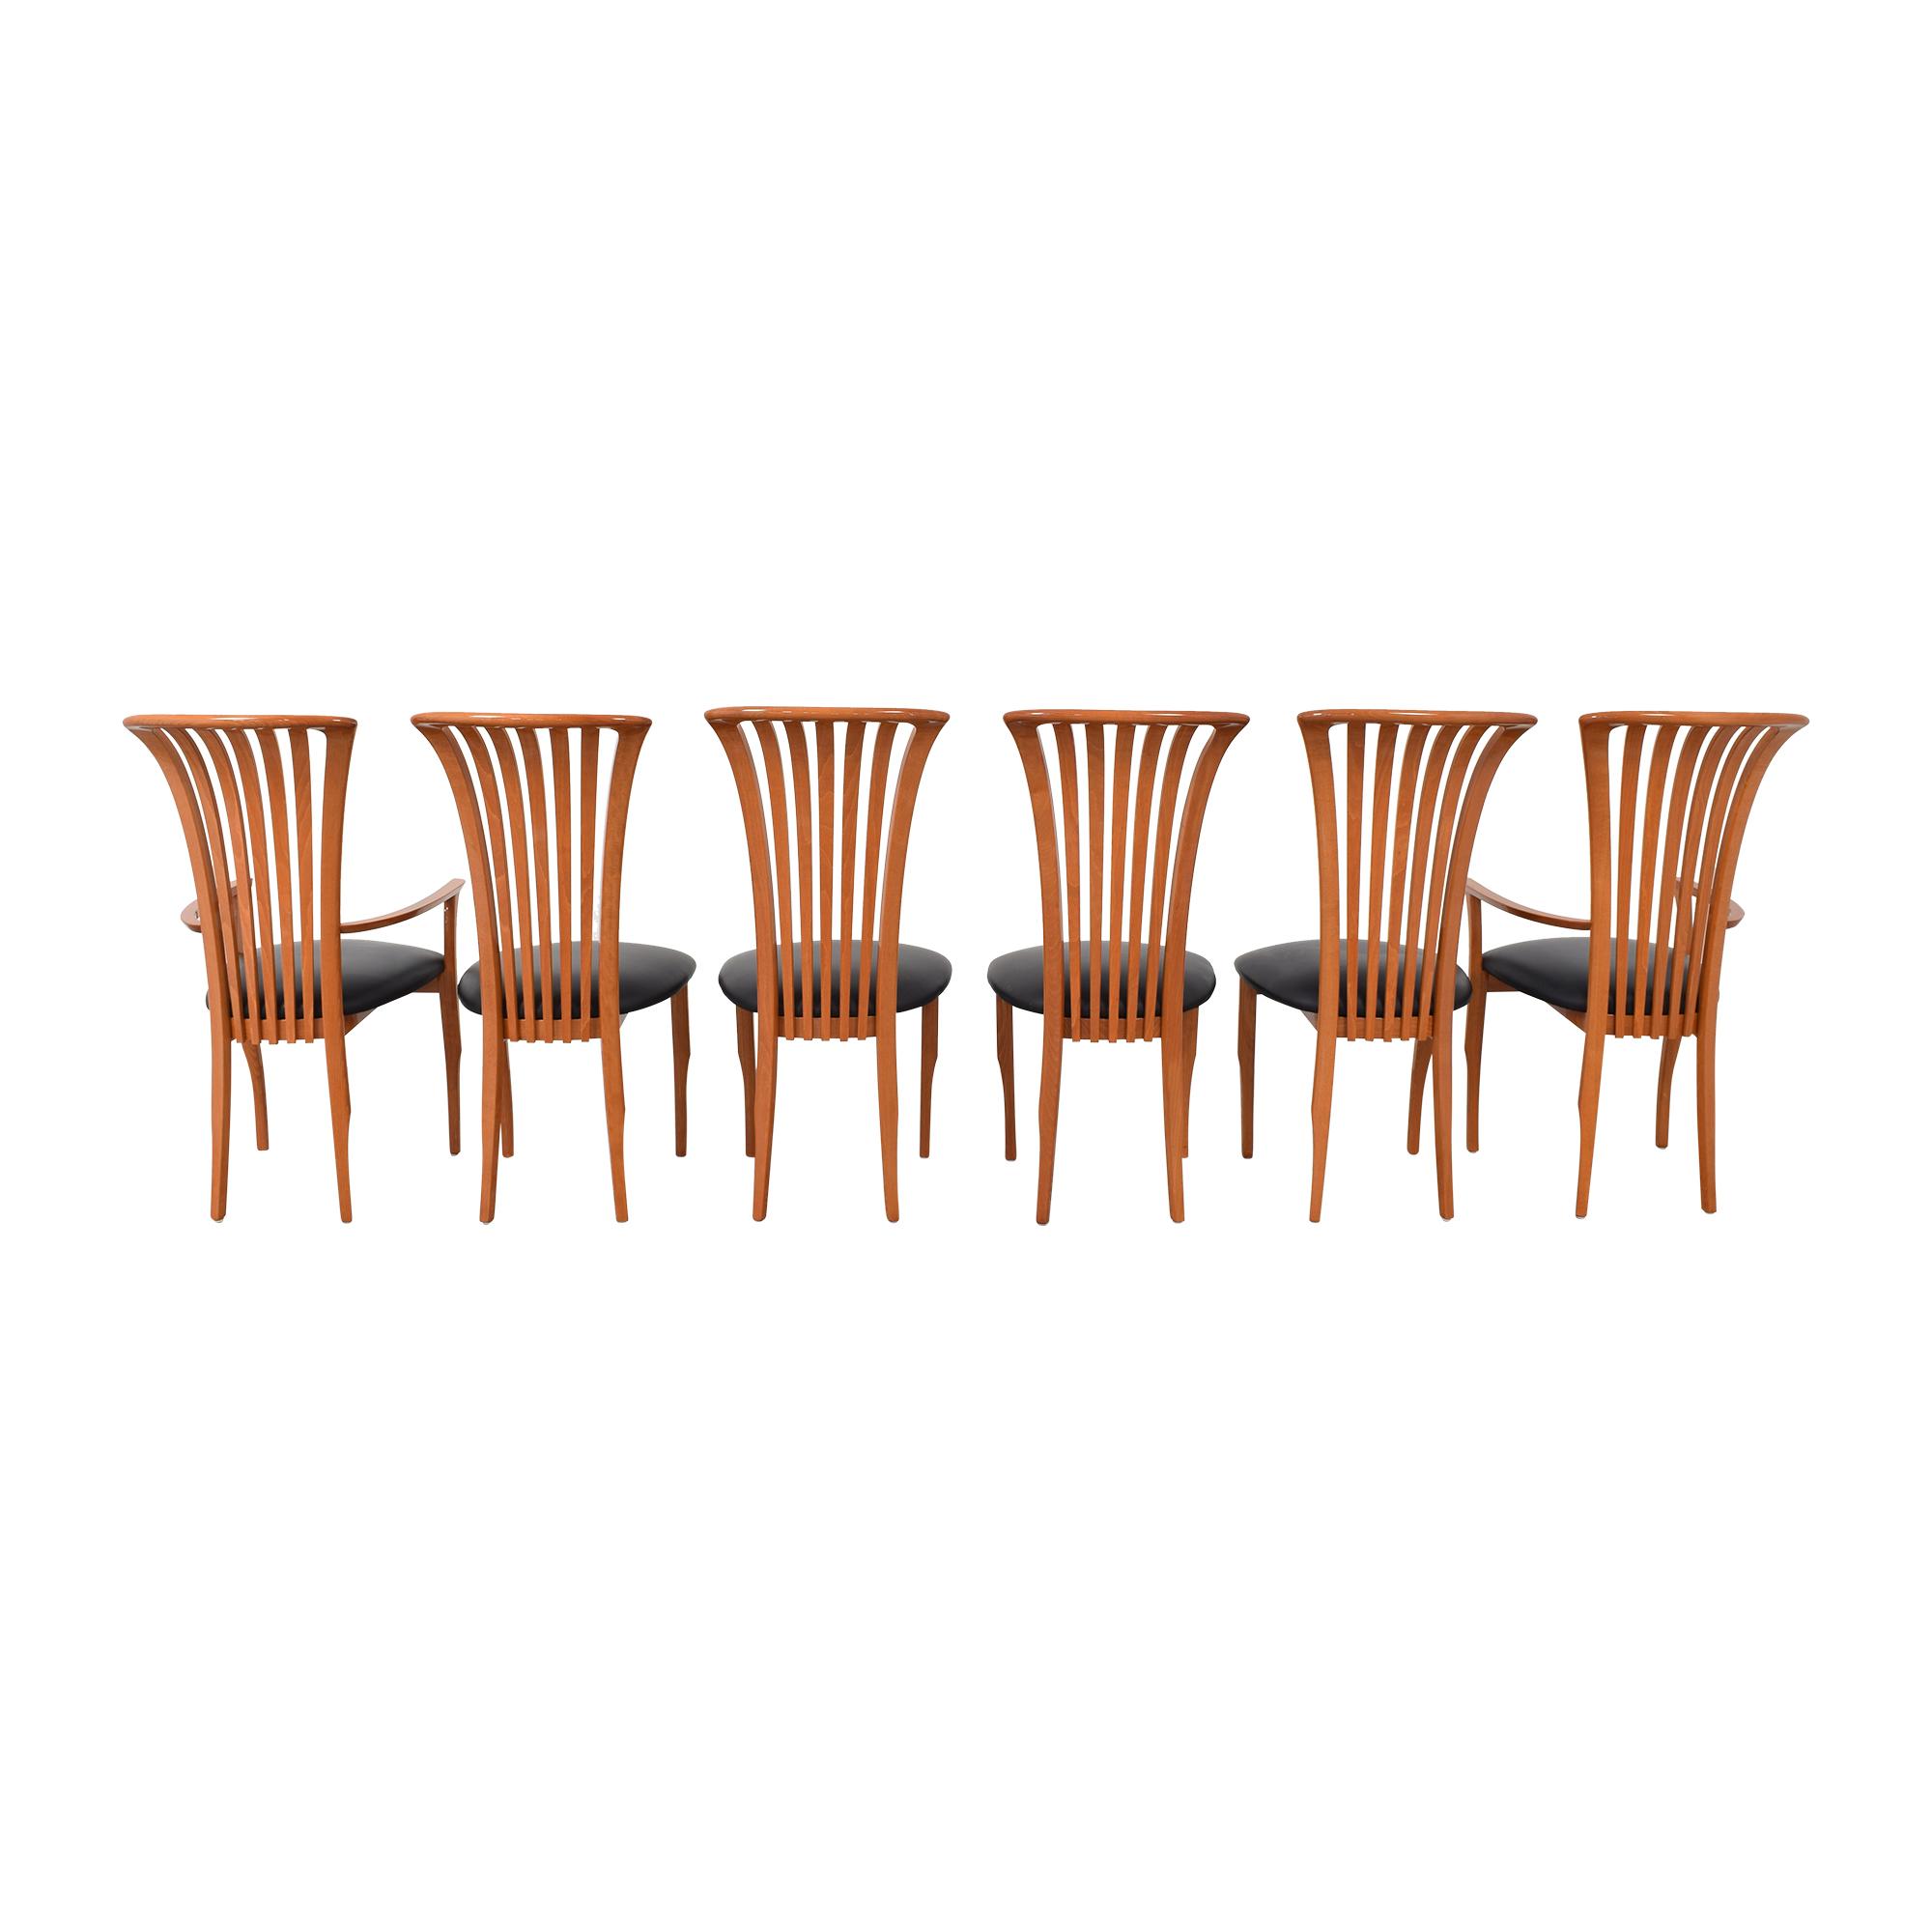 Pietro Costantini Pietro Costantini Modern Dining Chairs coupon